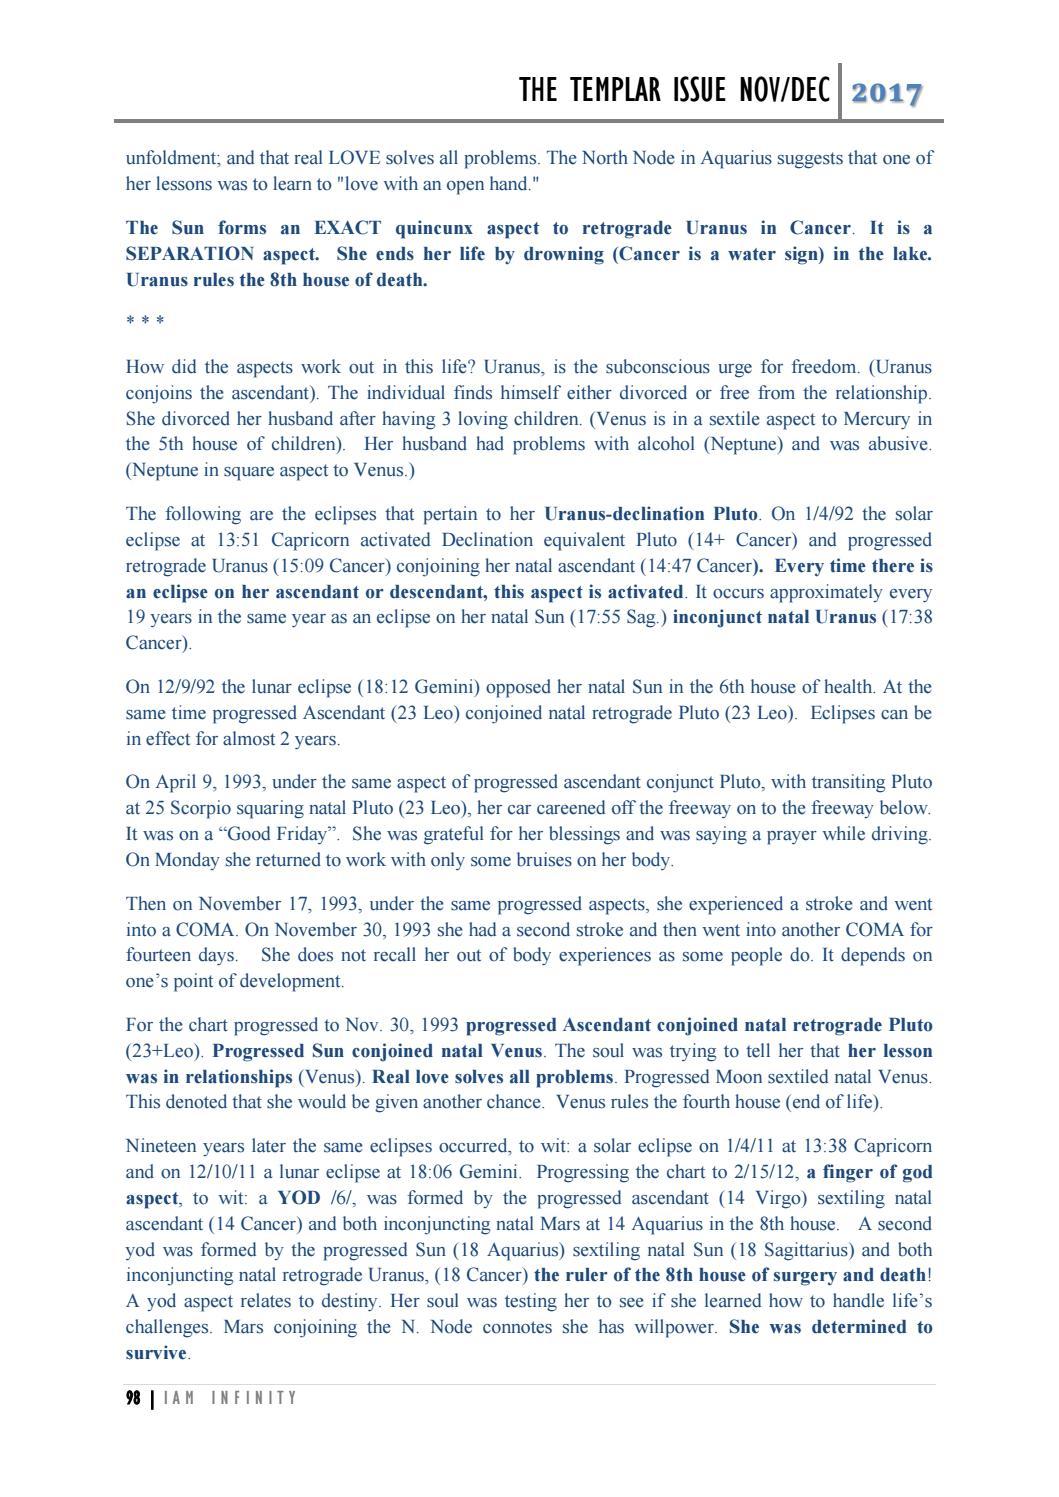 The Templar Issue #IAM 16 #Nov/Dec2017 by IAM INFINITY - issuu